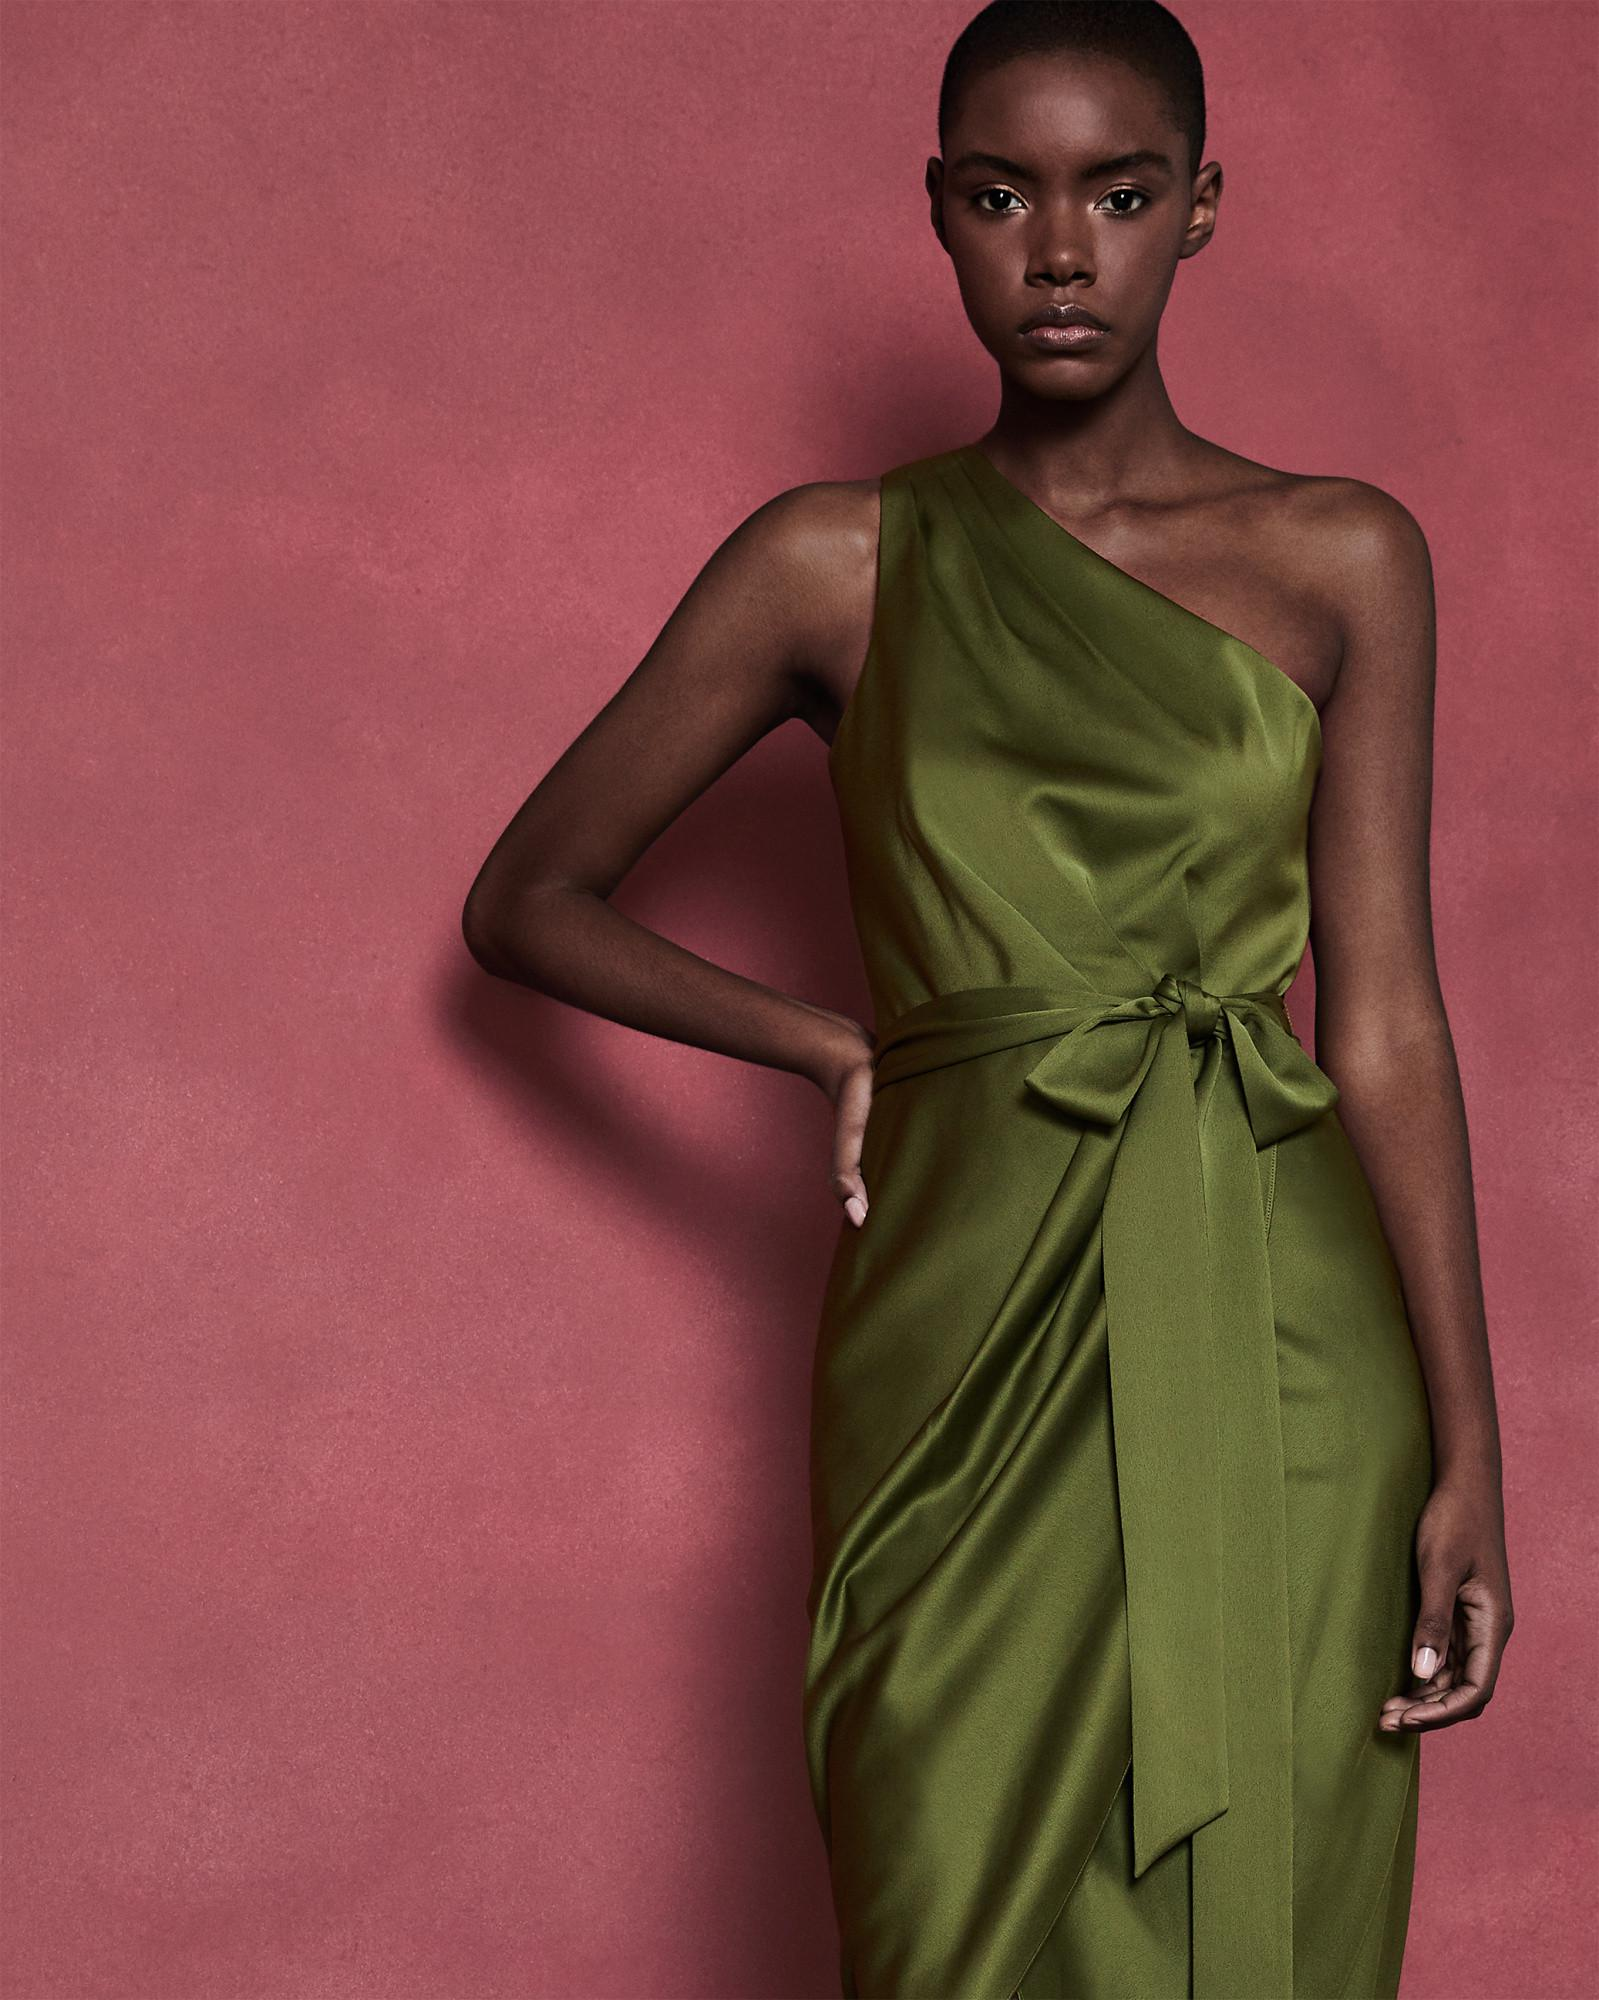 b1c3dfb5c Lyst - Ted Baker One Shoulder Drape Midi Dress in Green - Save 30%